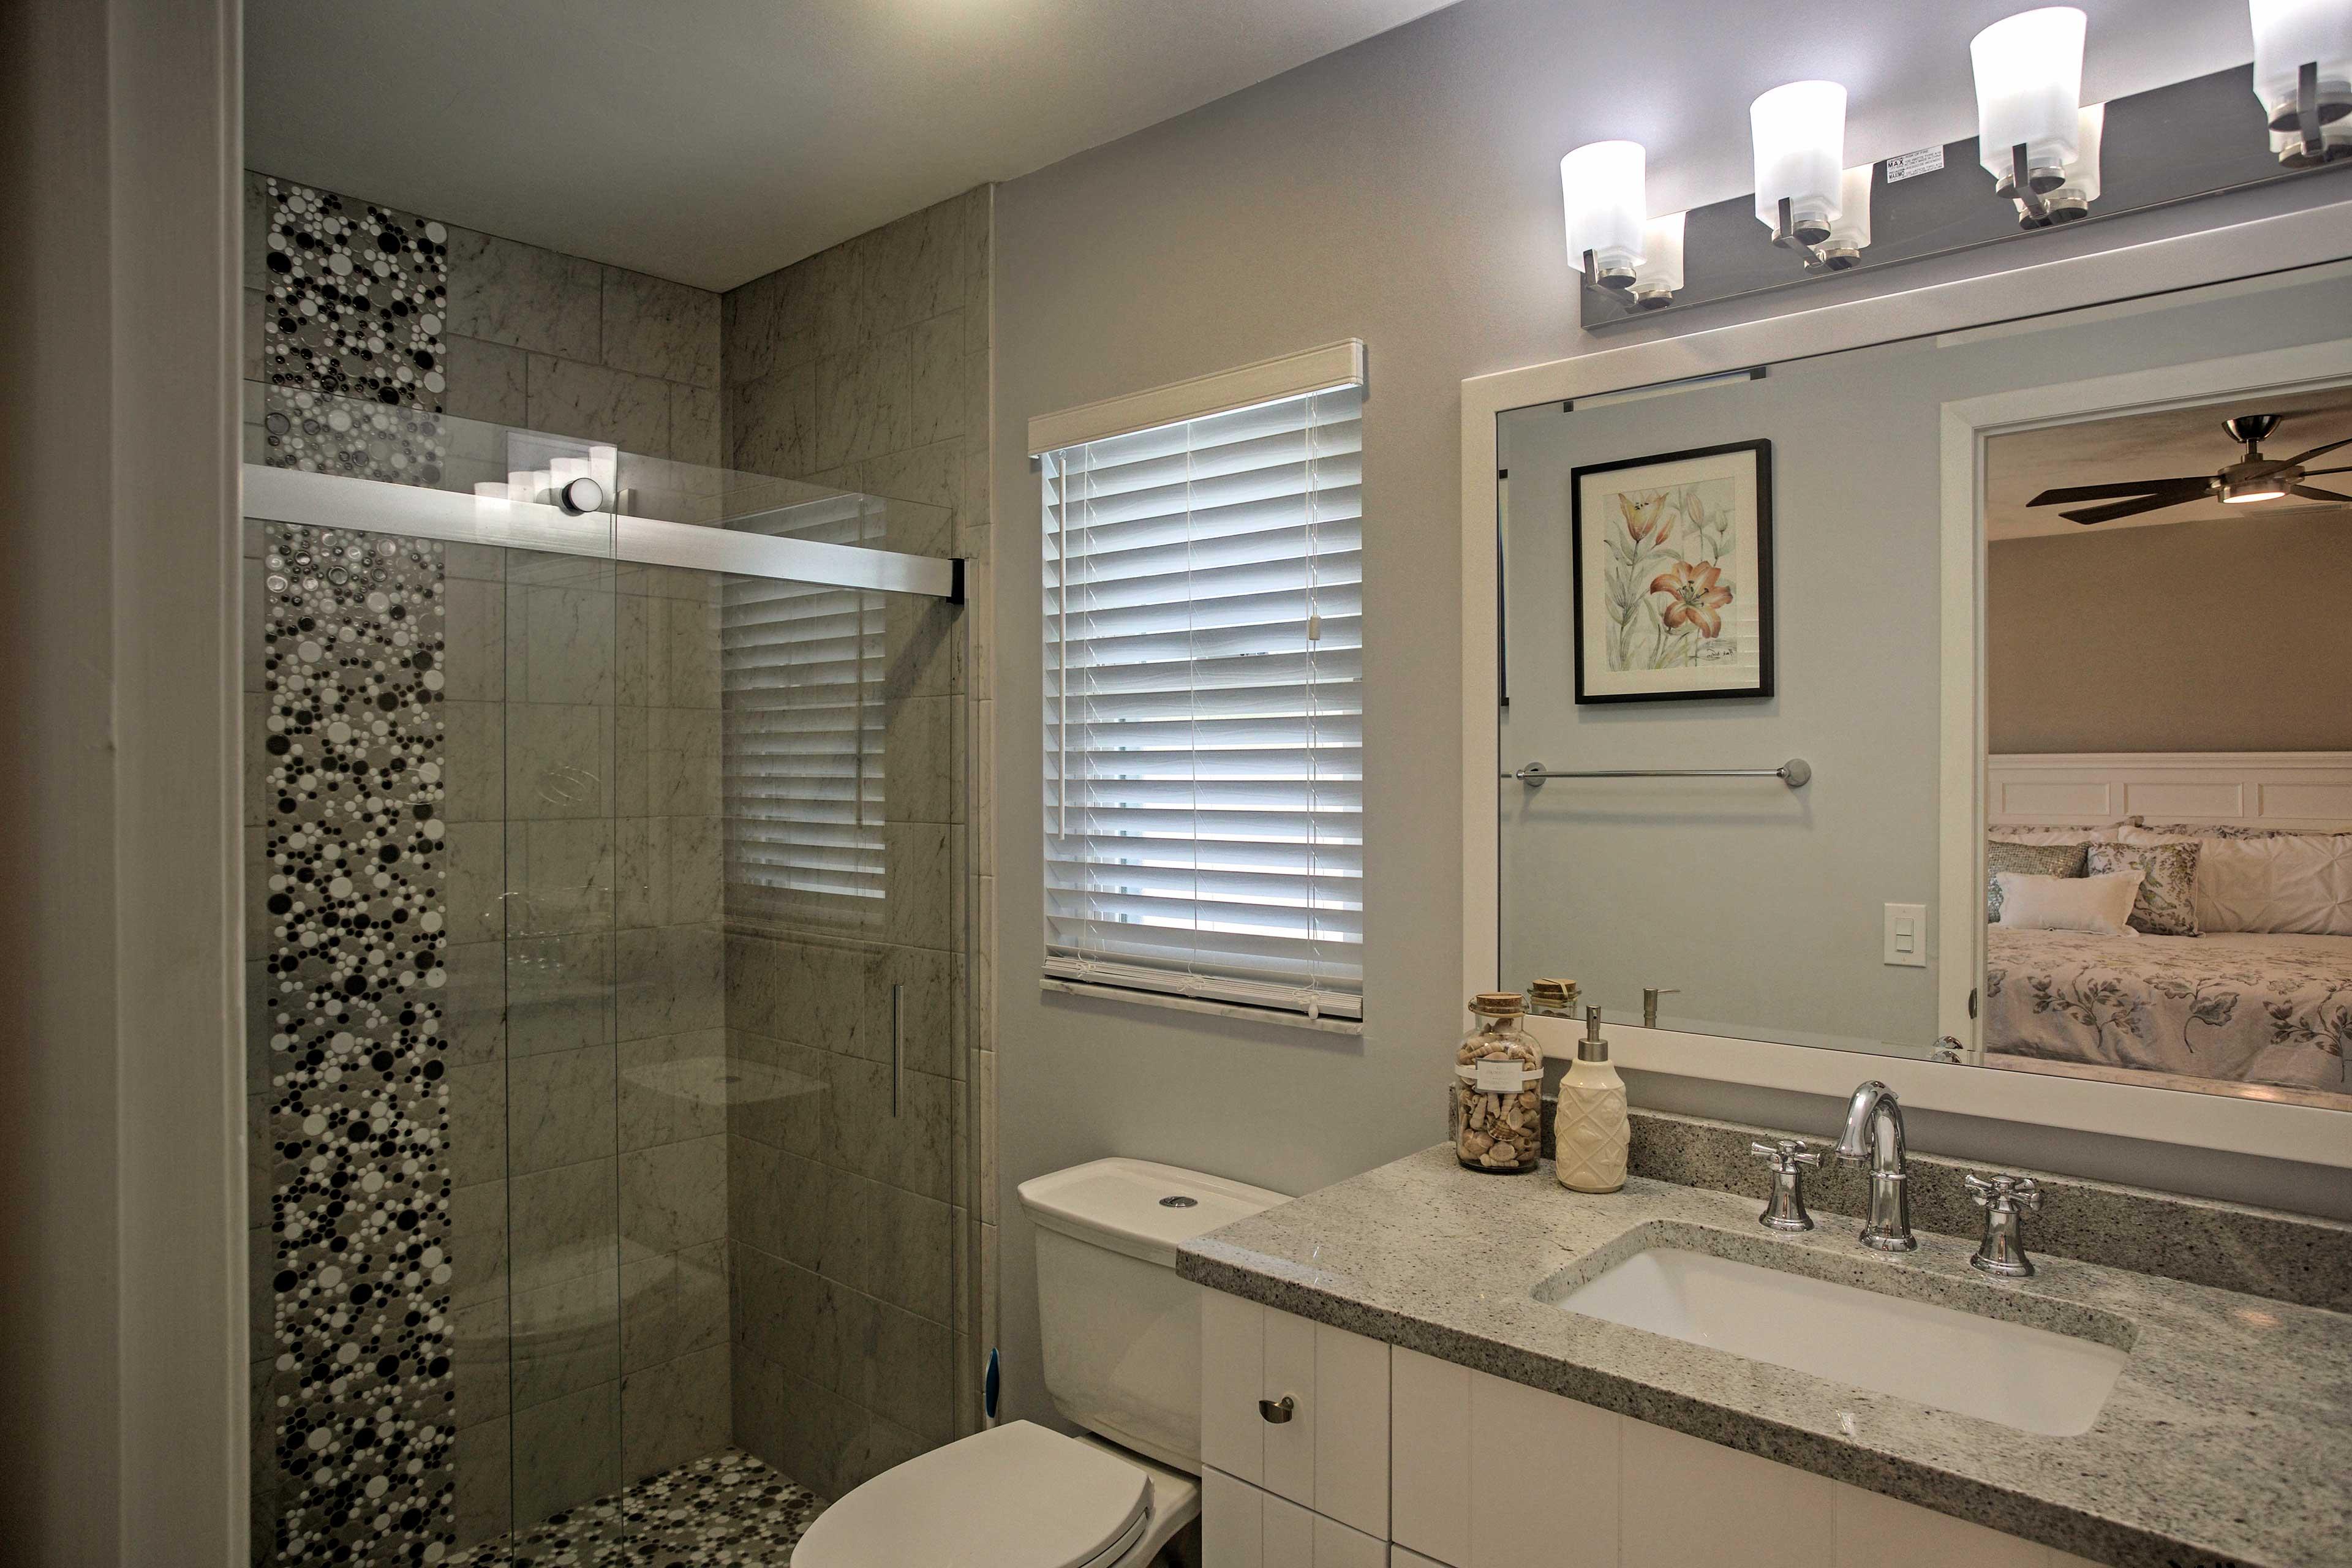 The master's en-suite bath boasts a pristine walk-in shower.